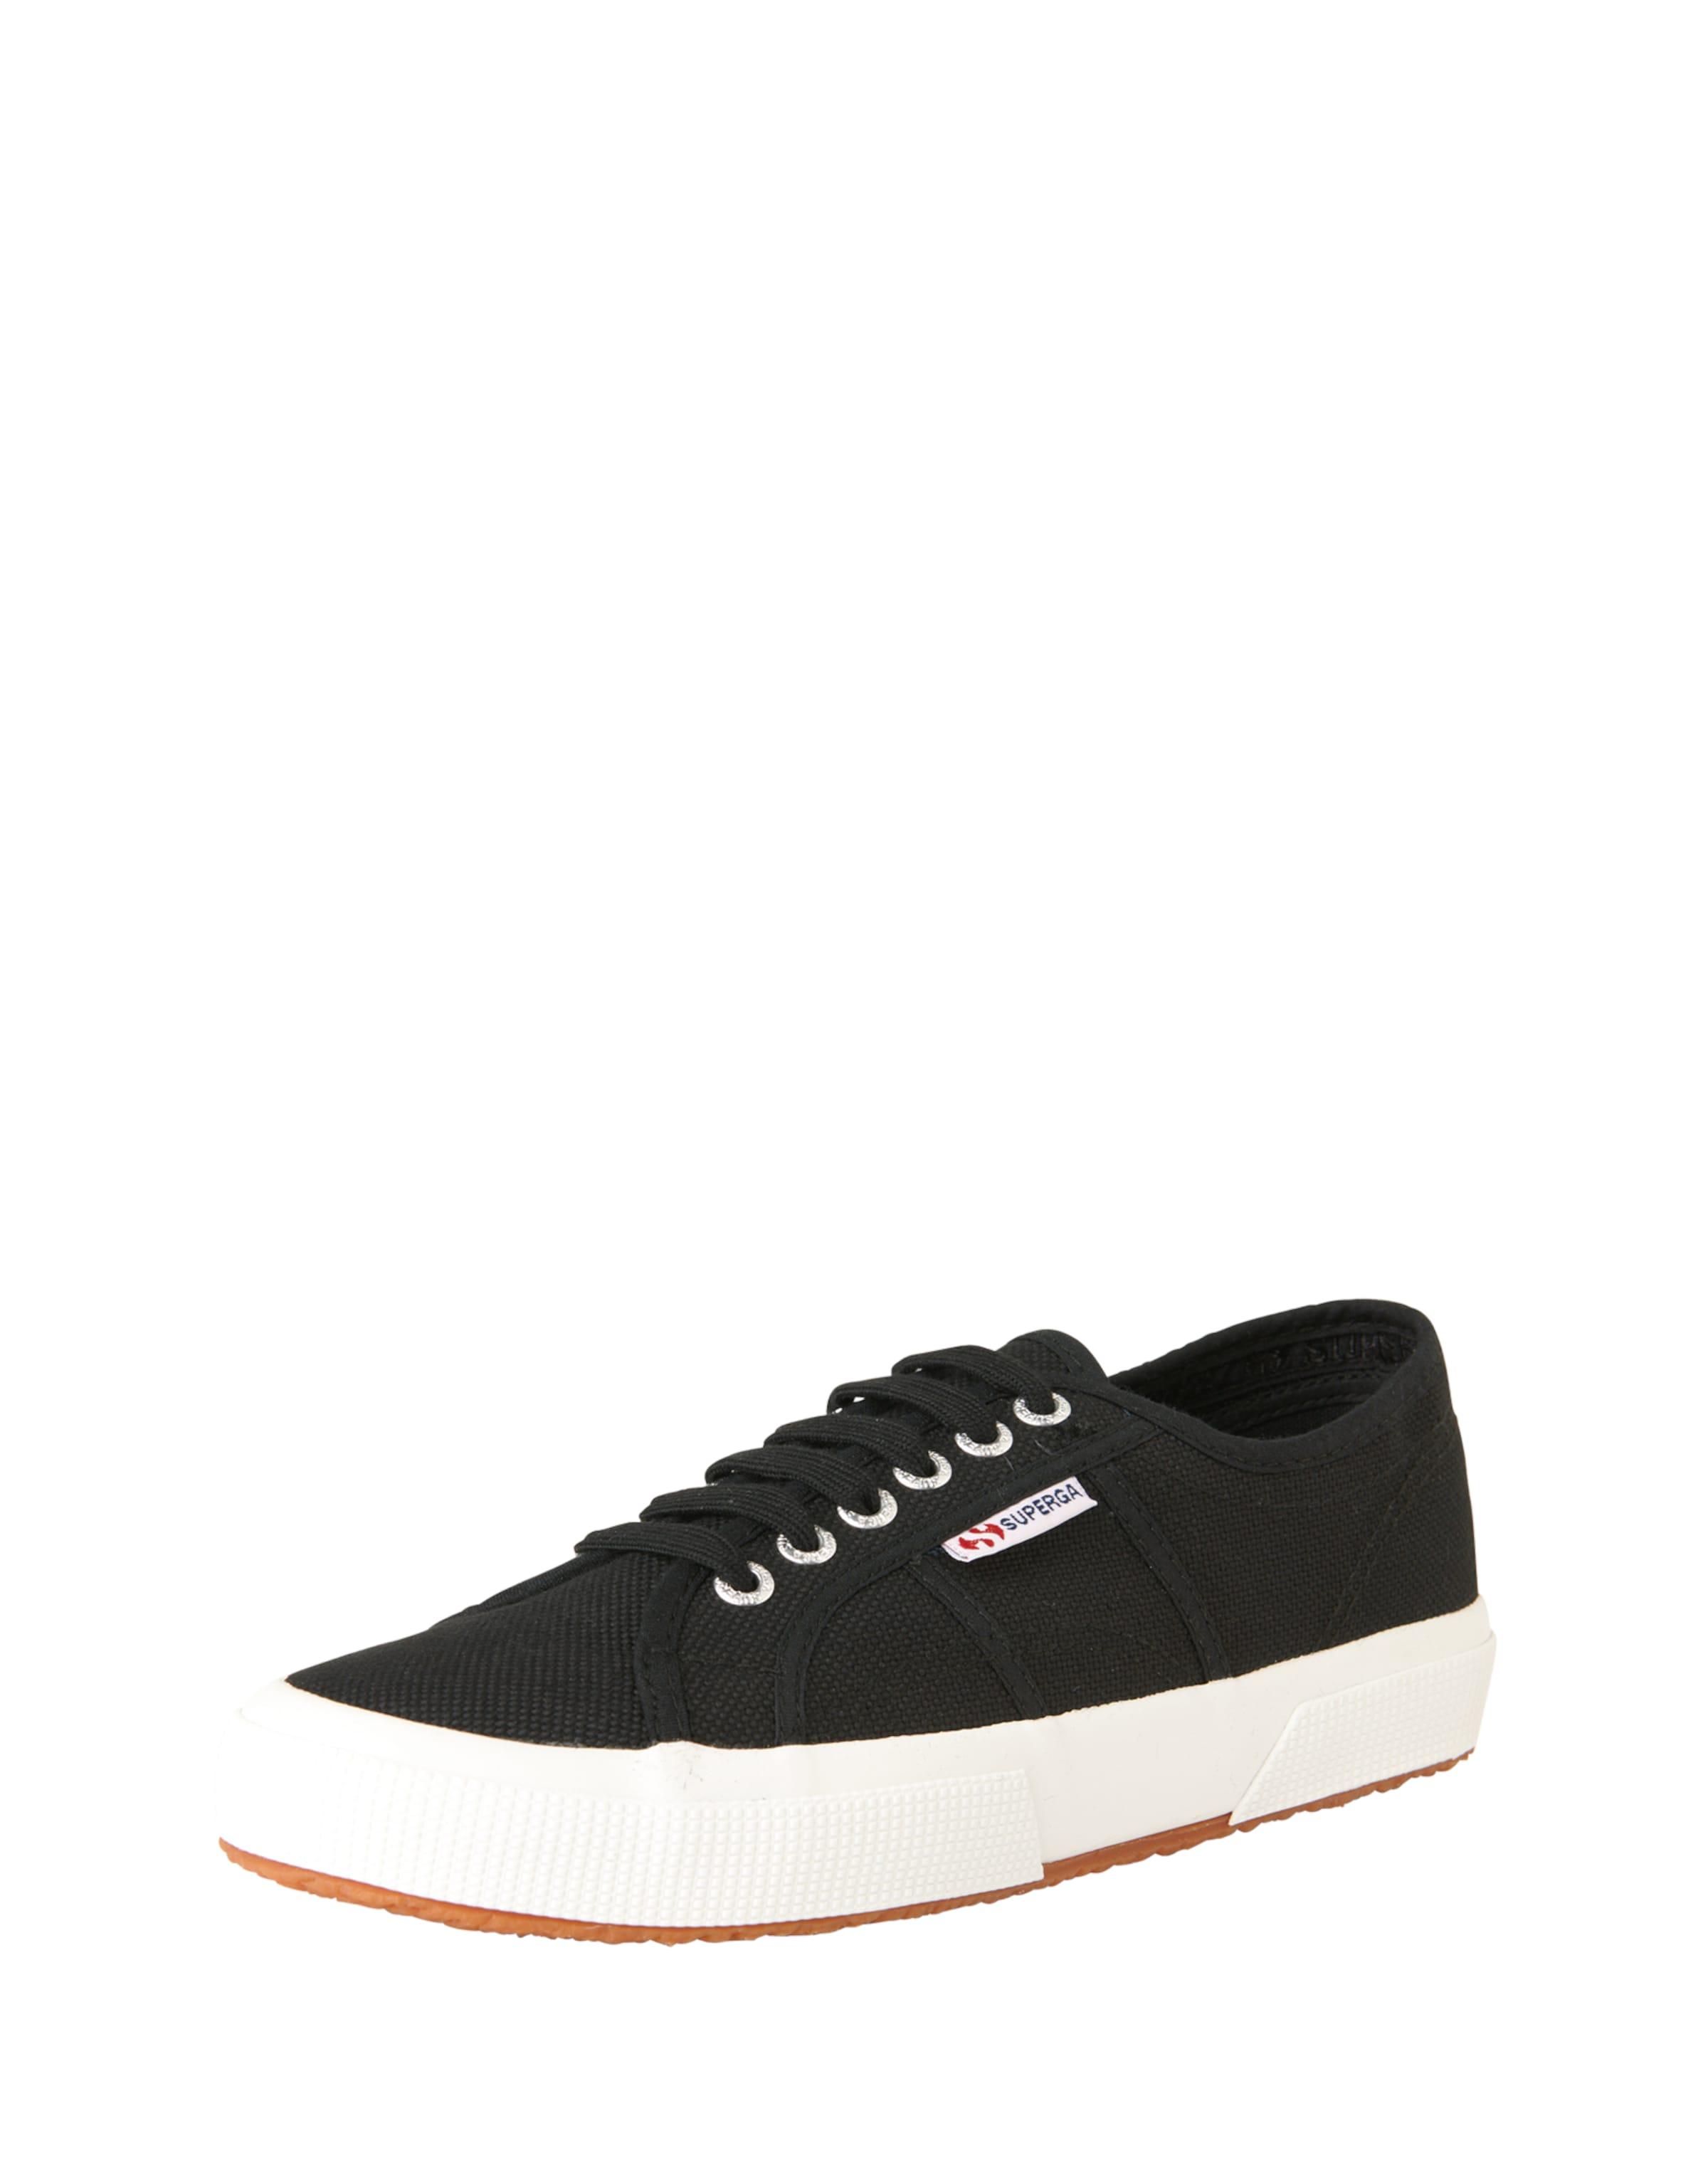 SUPERGA Sneaker 2750 Cotu Classic Hohe Qualität